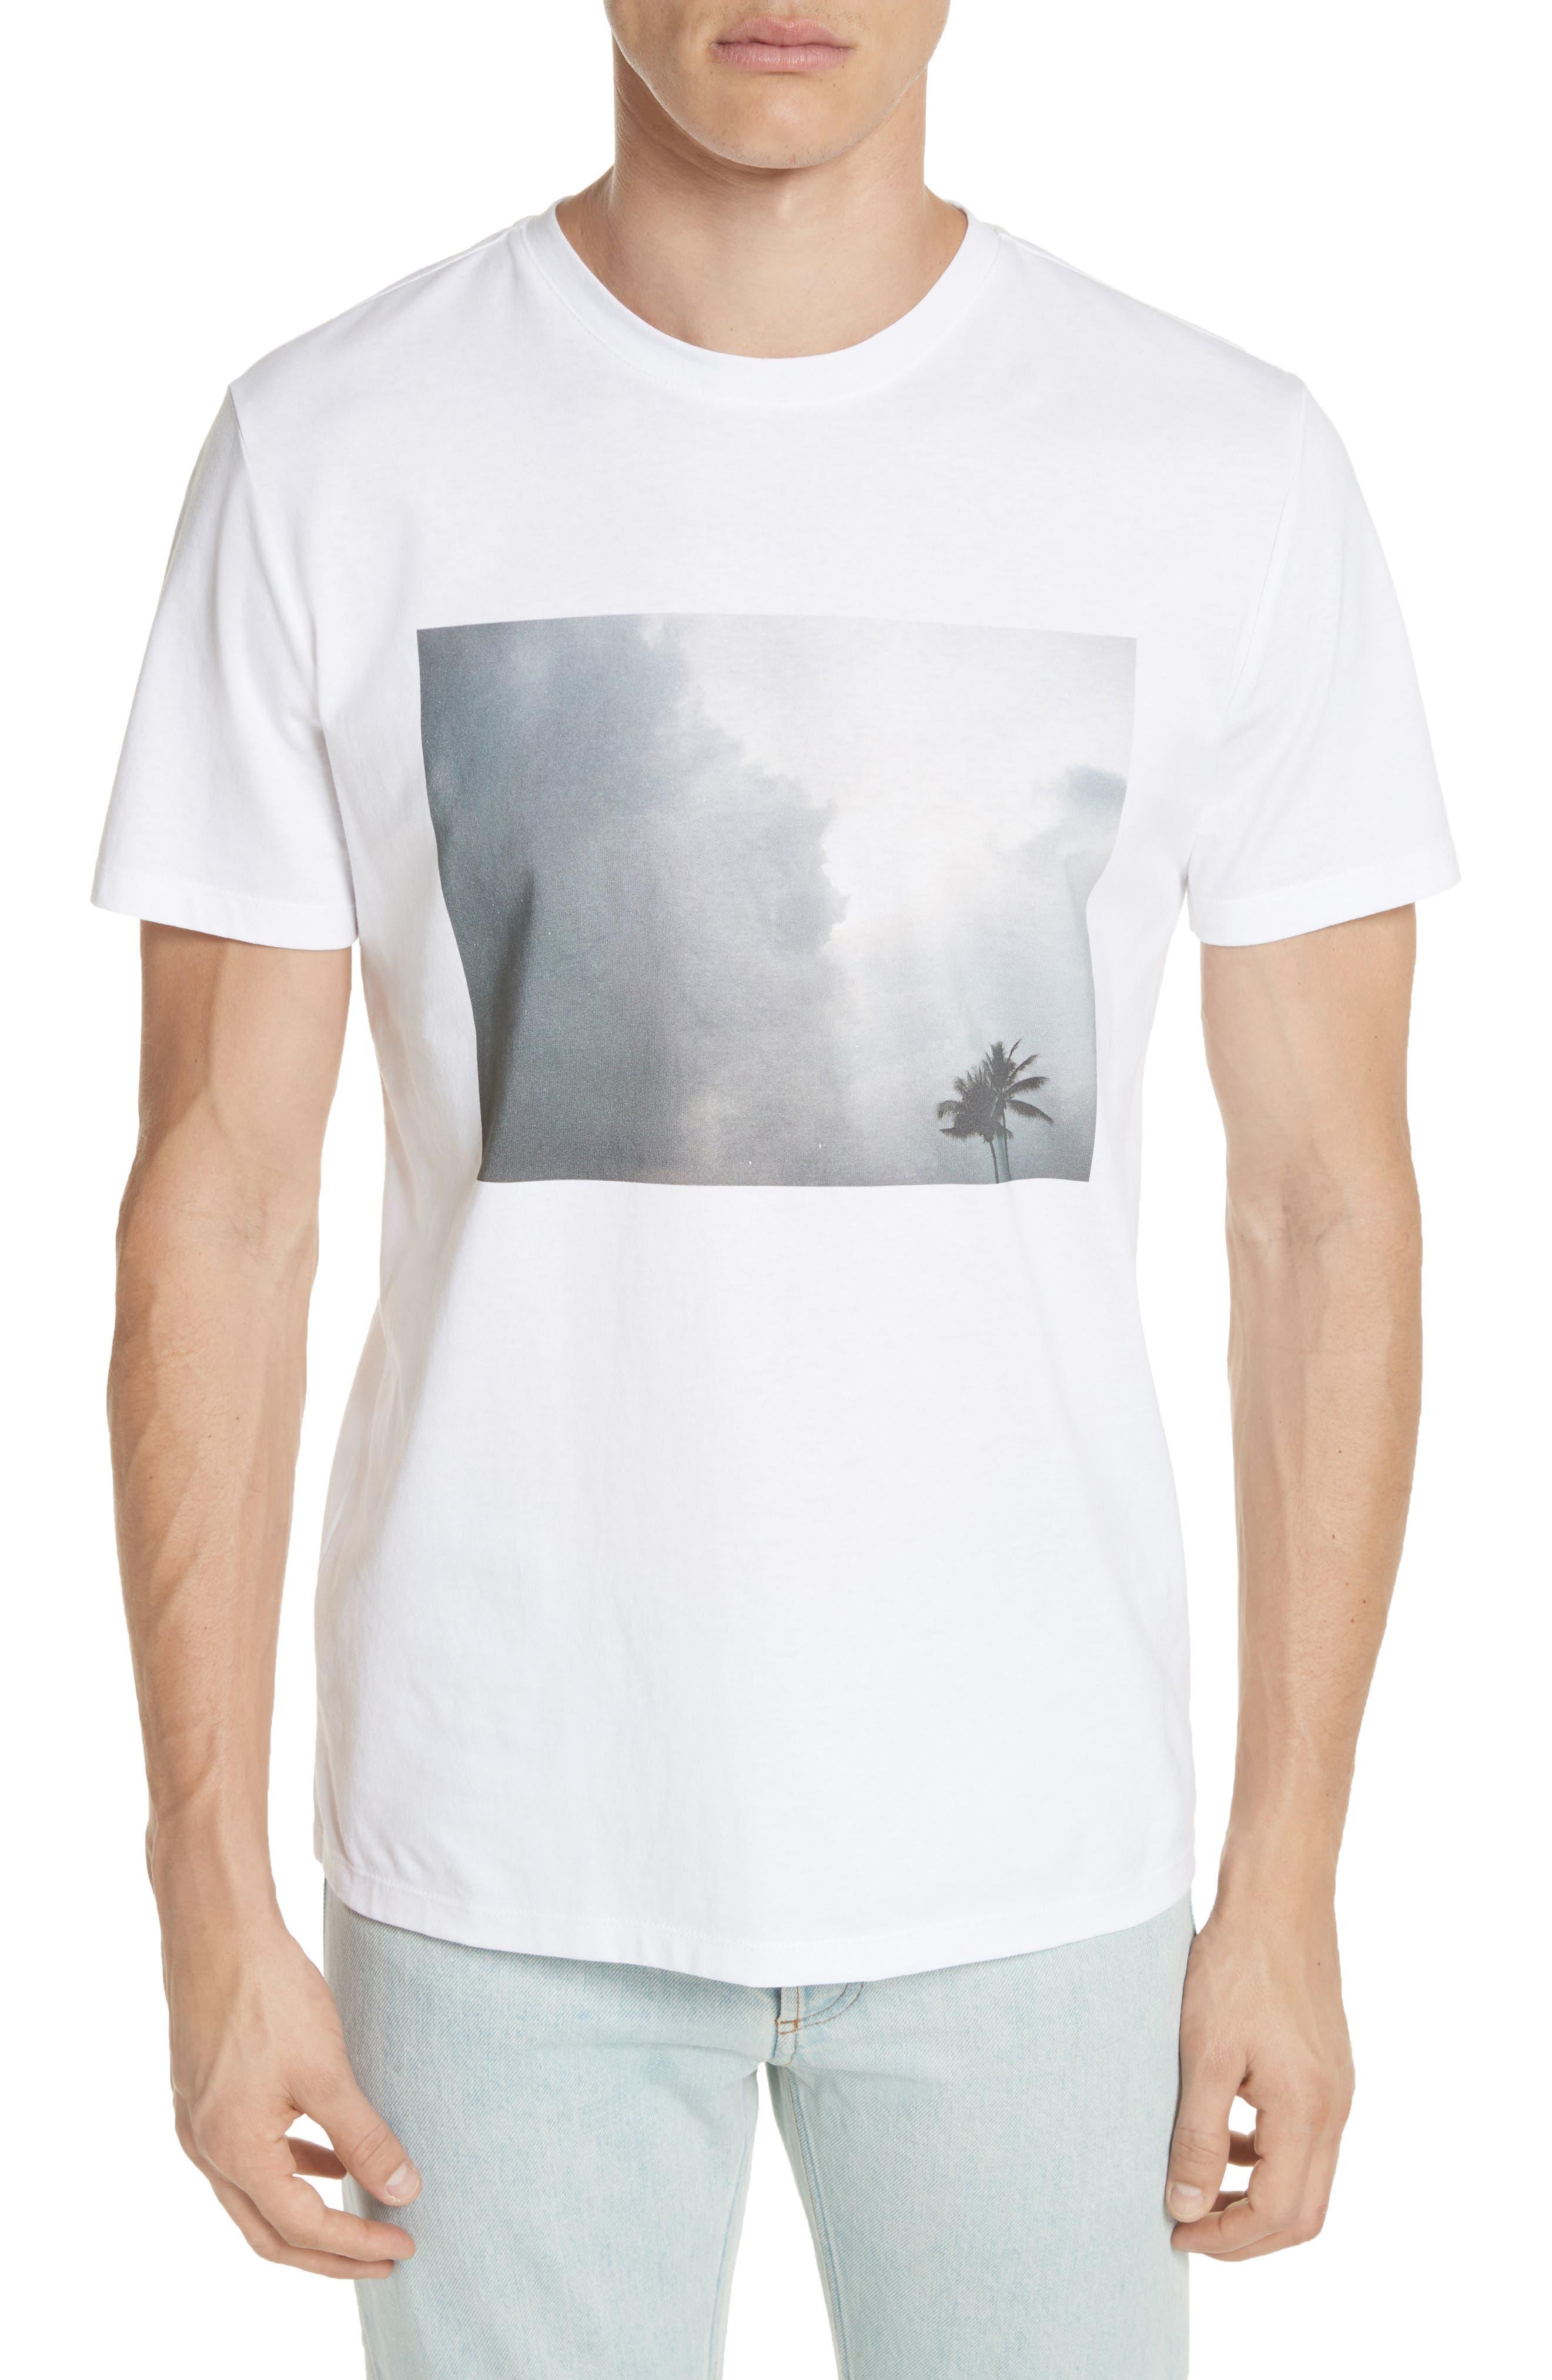 Tropicool Graphic T-Shirt,                             Main thumbnail 1, color,                             100